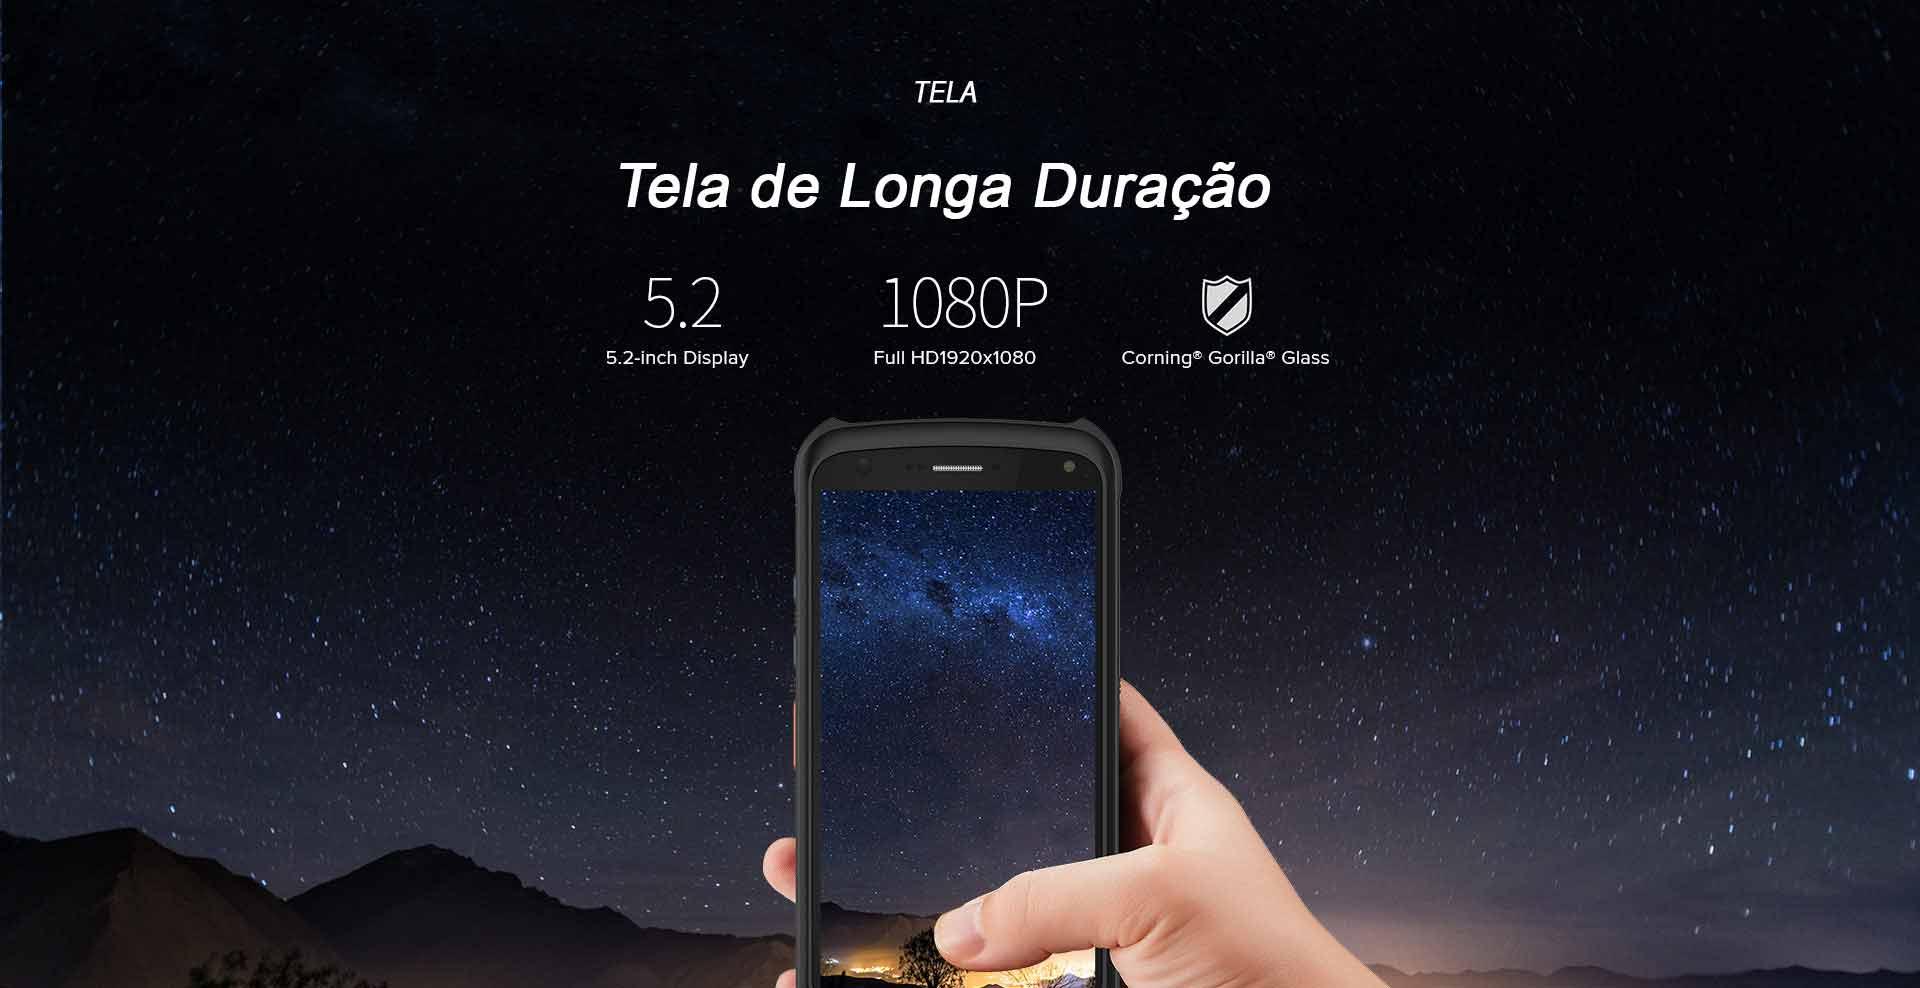 Terminal móvel C70 CHAINWAY Android Tela